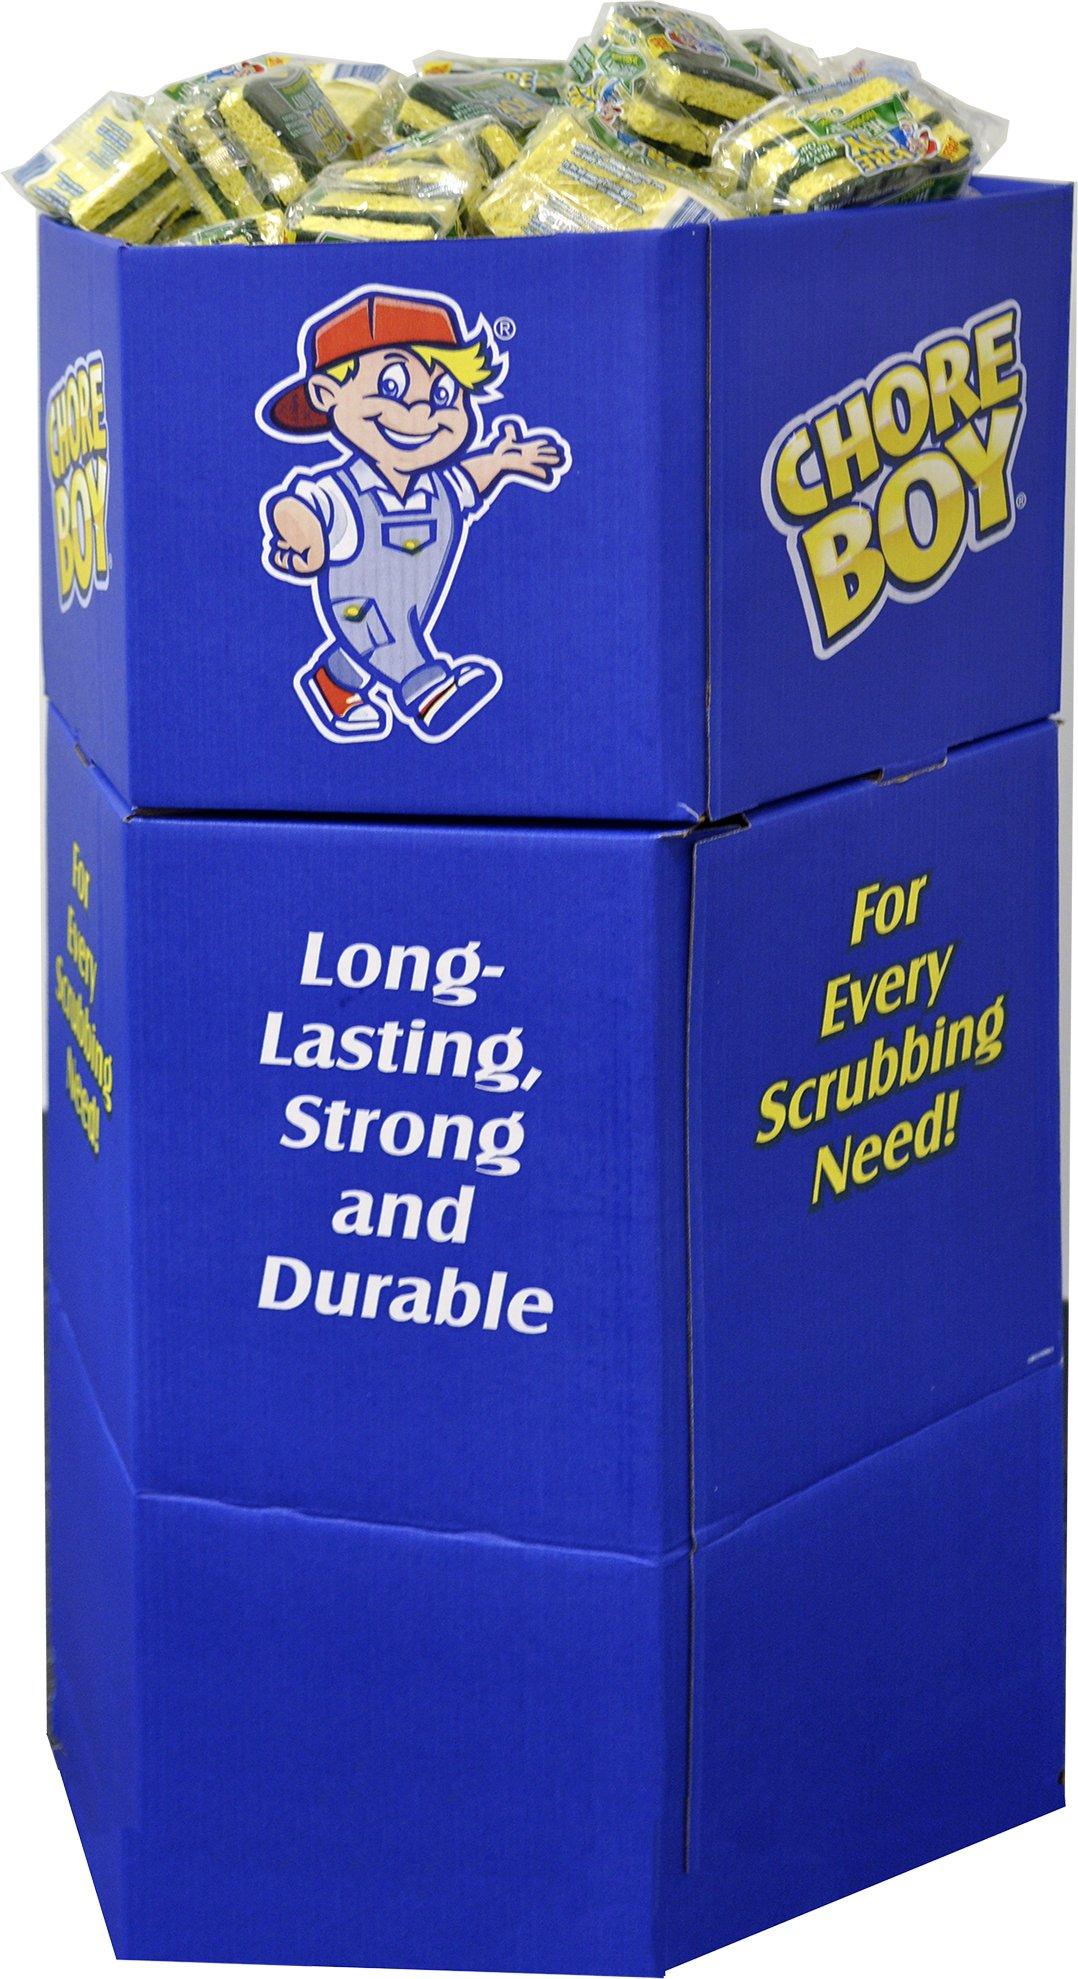 Chore Boy All Purpose & Heavy Duty 3S Dump Bin Display